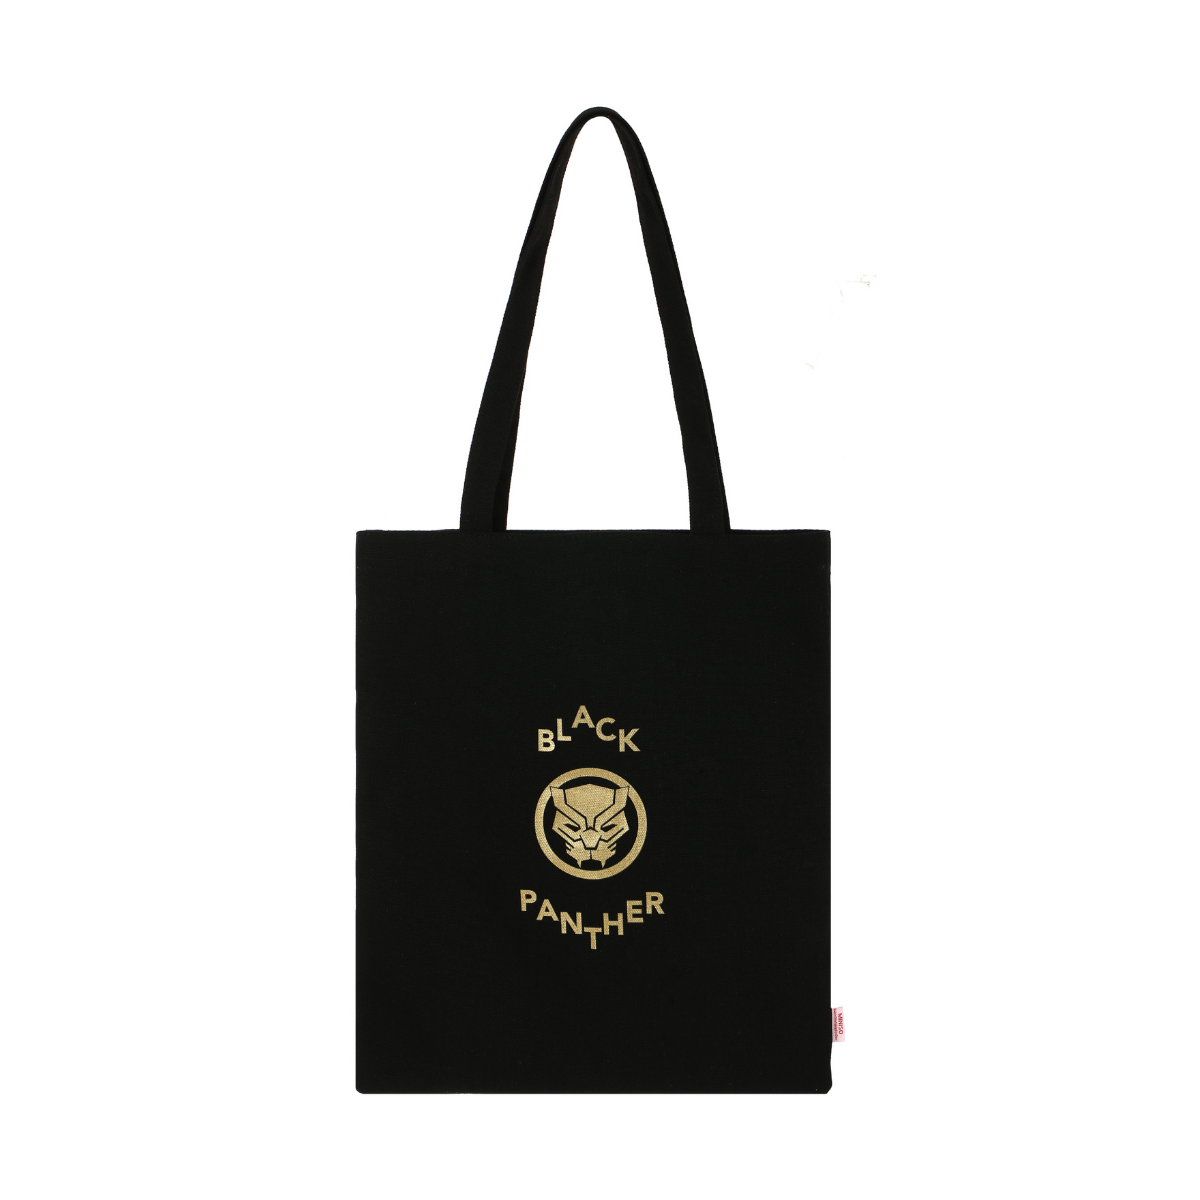 Black Panther Miniso Tote Bag